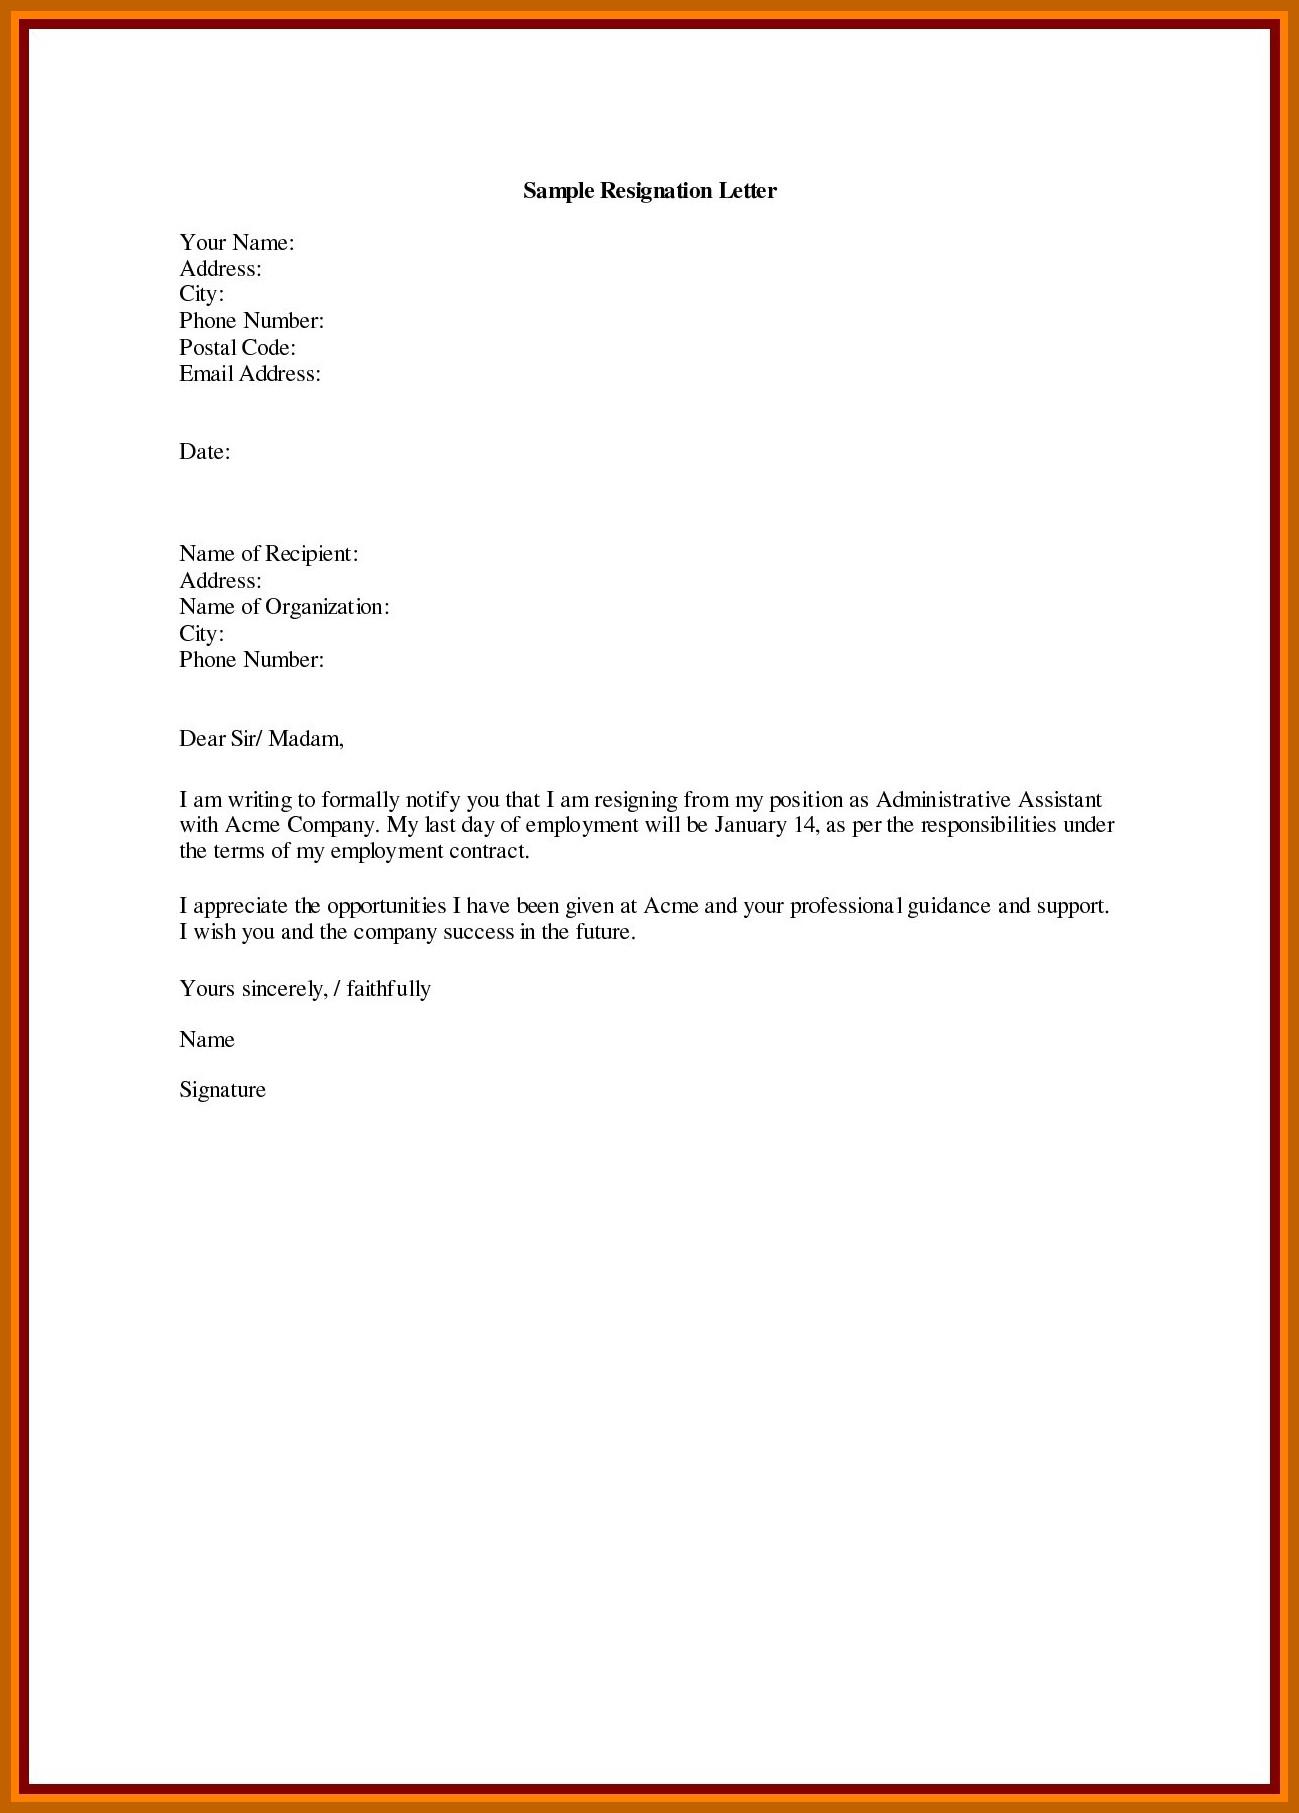 30 Resignation Letter Personal Reason | Simple Template Design